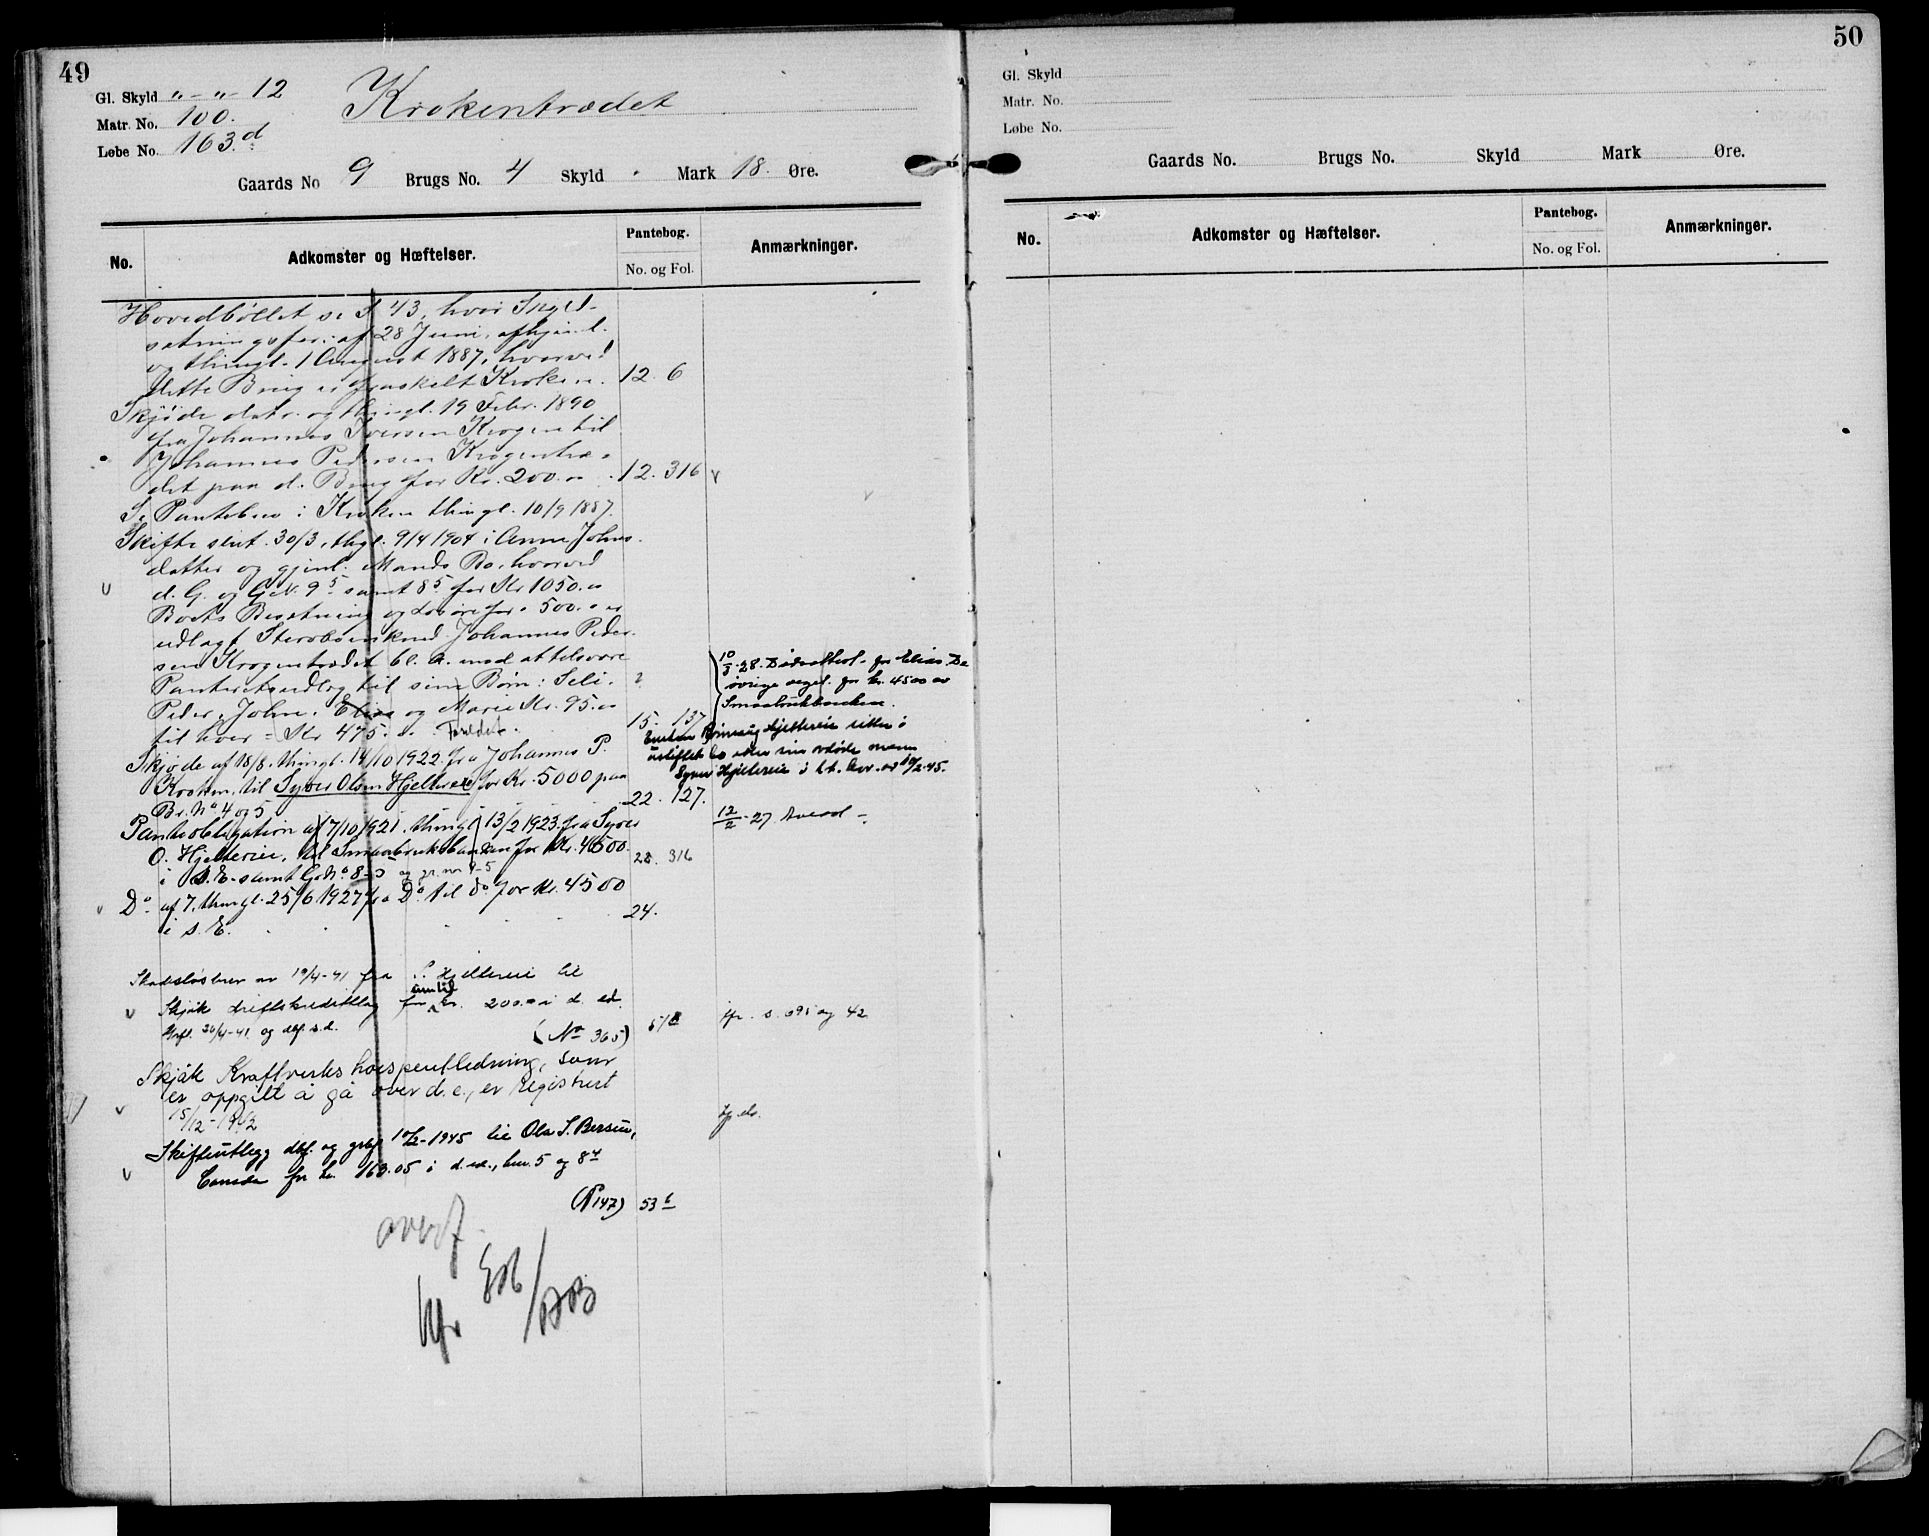 SAH, Nord-Gudbrandsdal tingrett, H/Ha/Had/L0004: Panteregister nr. 4, 1898-1950, s. 49-50